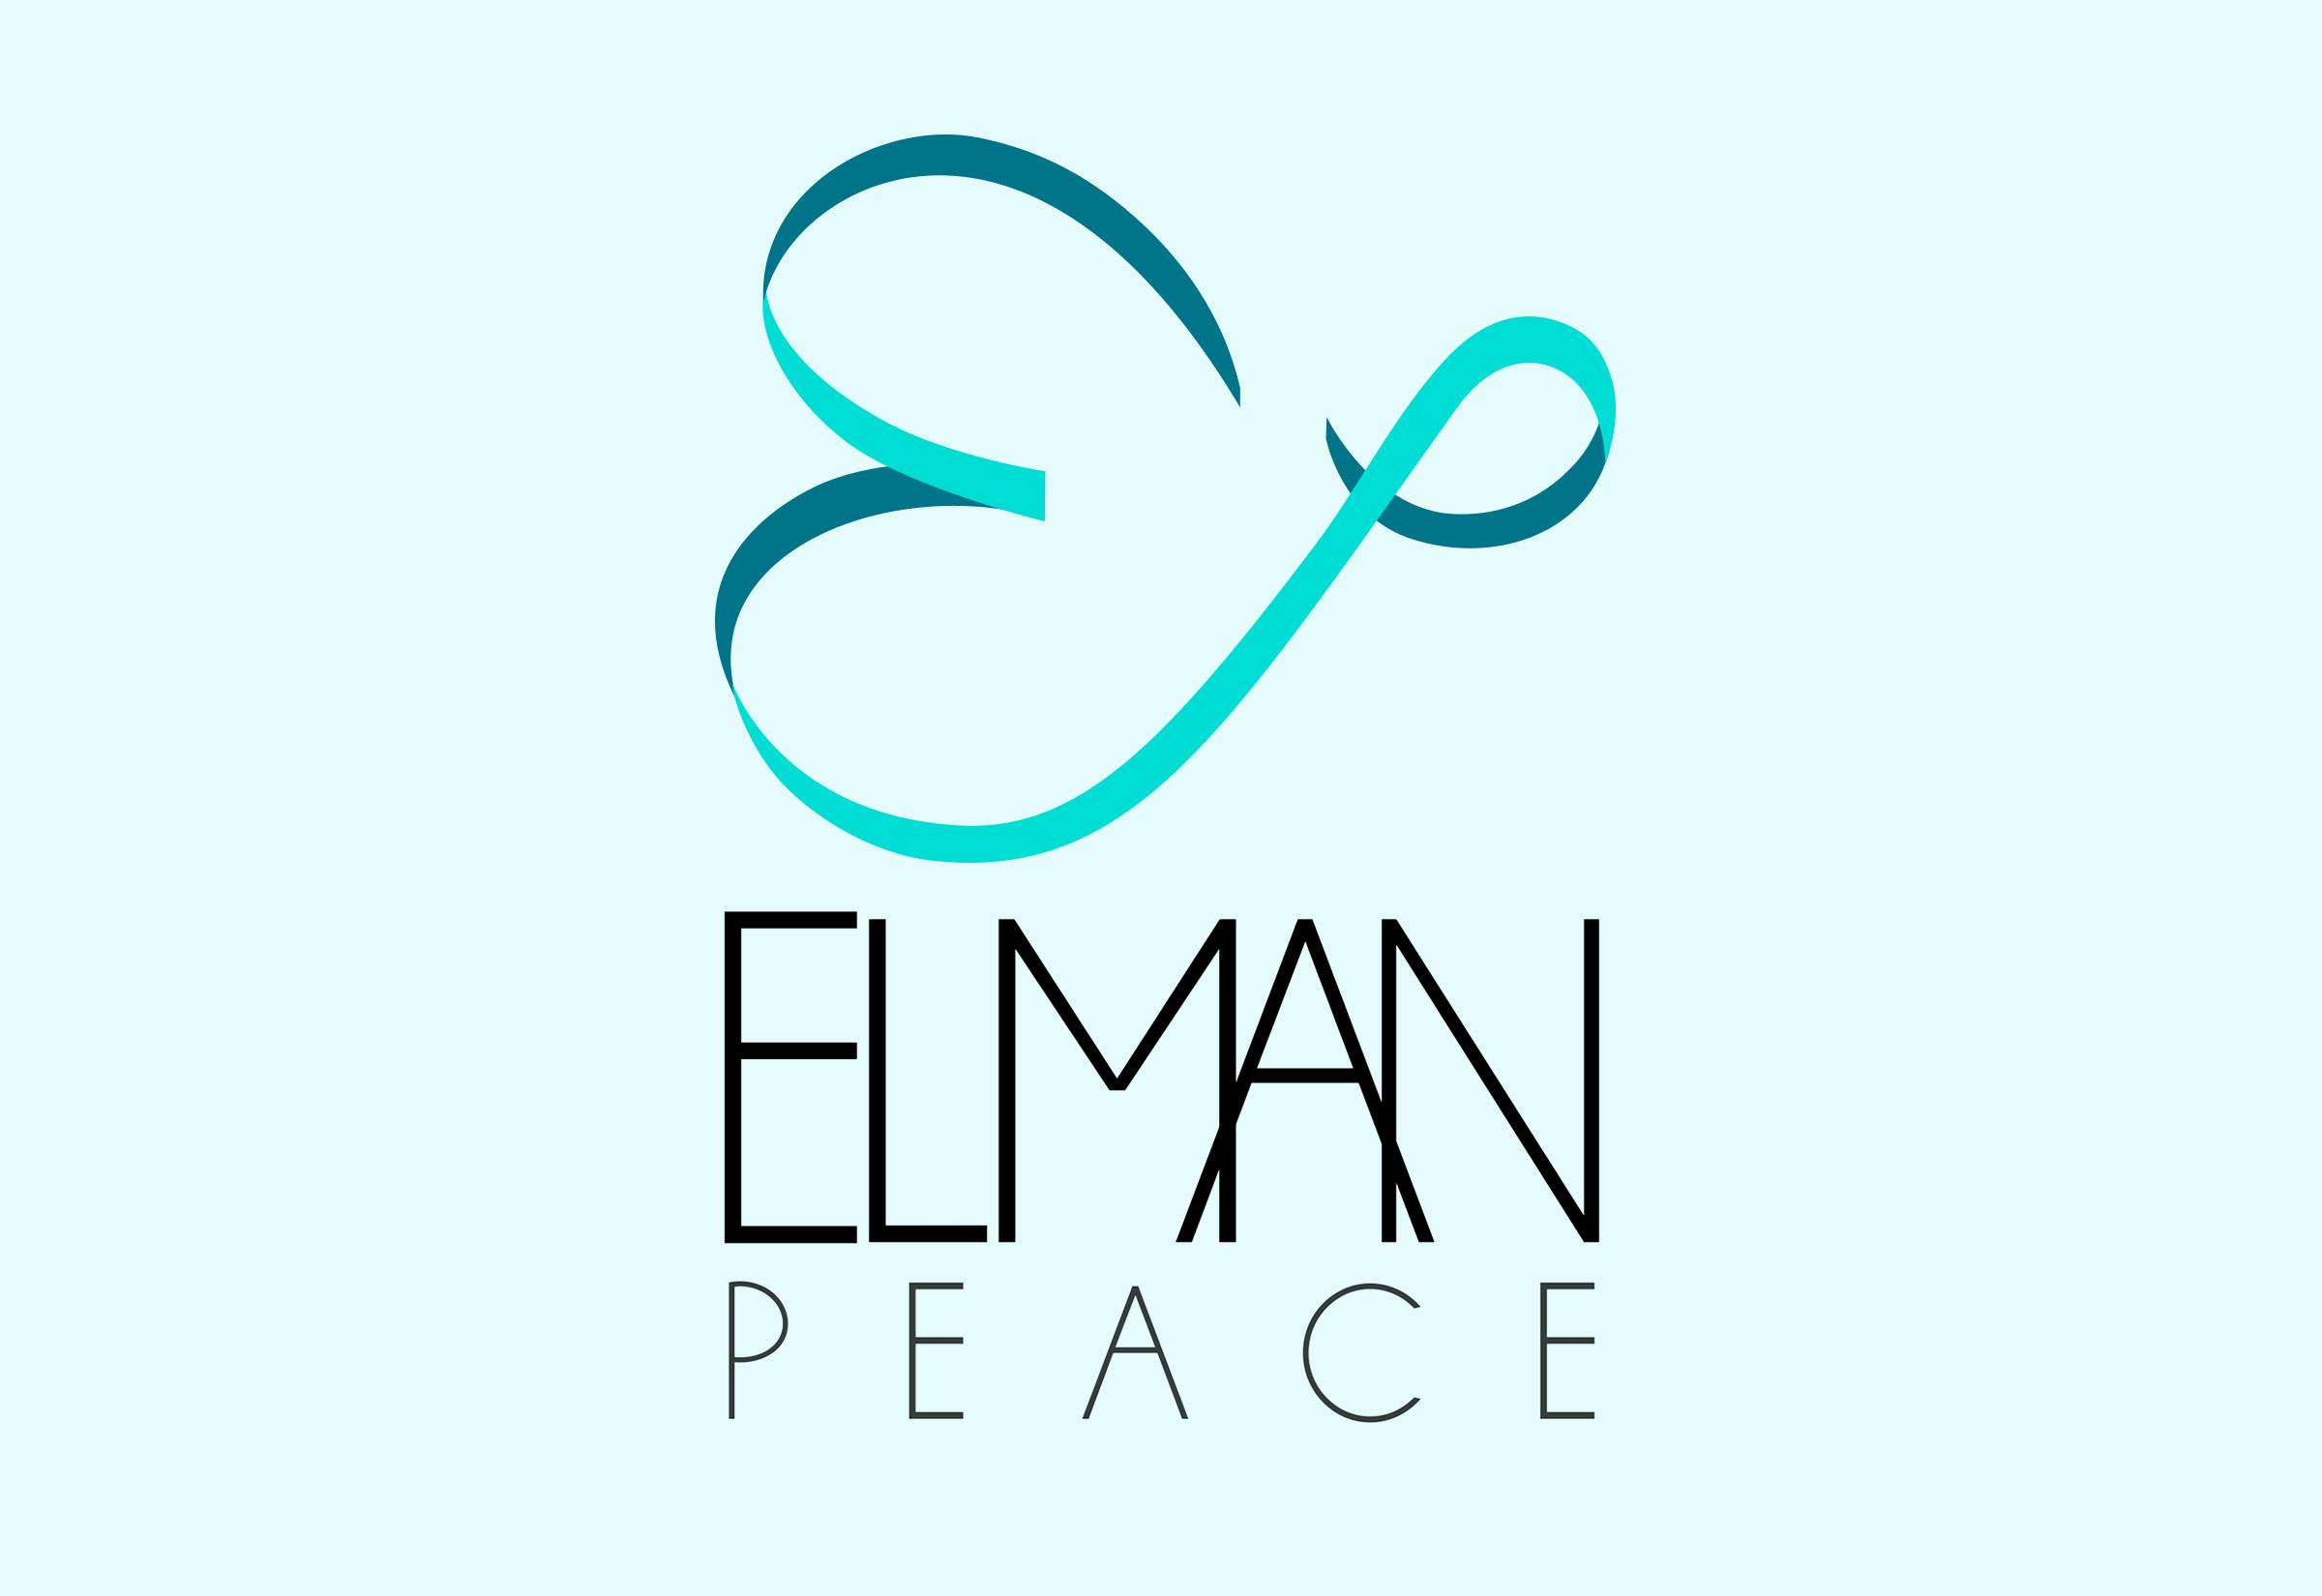 Elman_logo_blue2.jpg